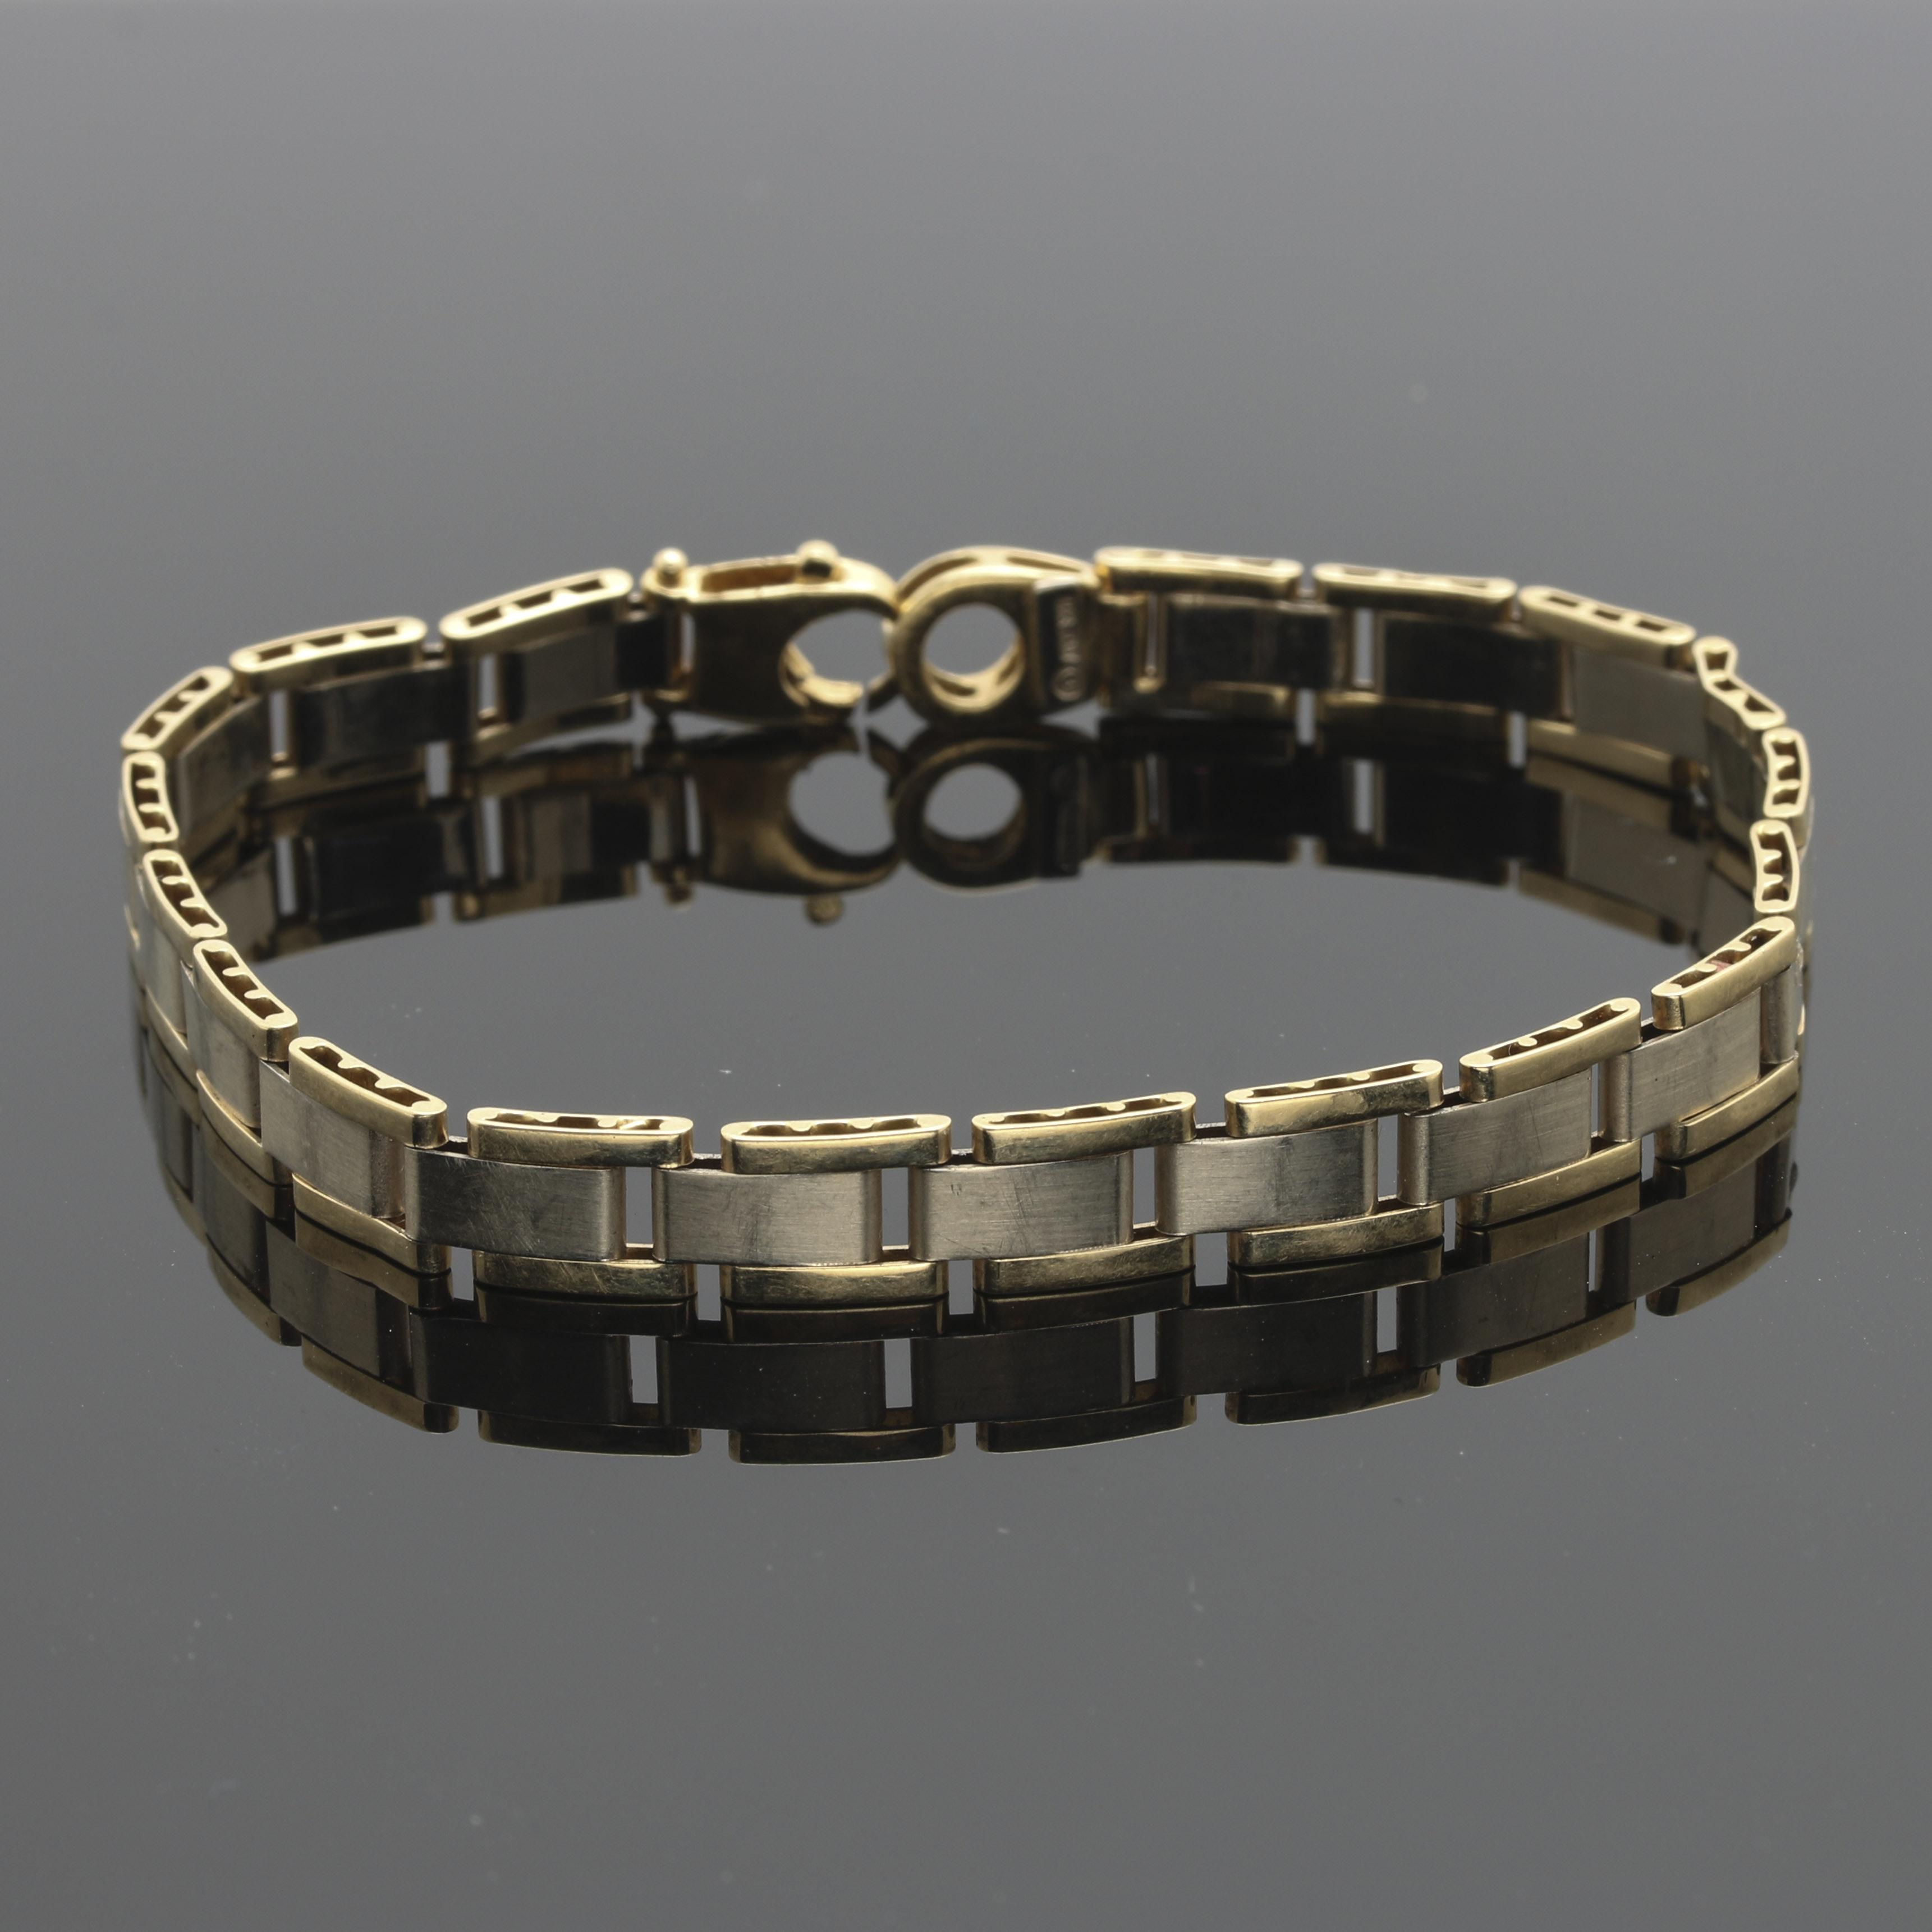 14K Yellow Gold Linked Bracelet